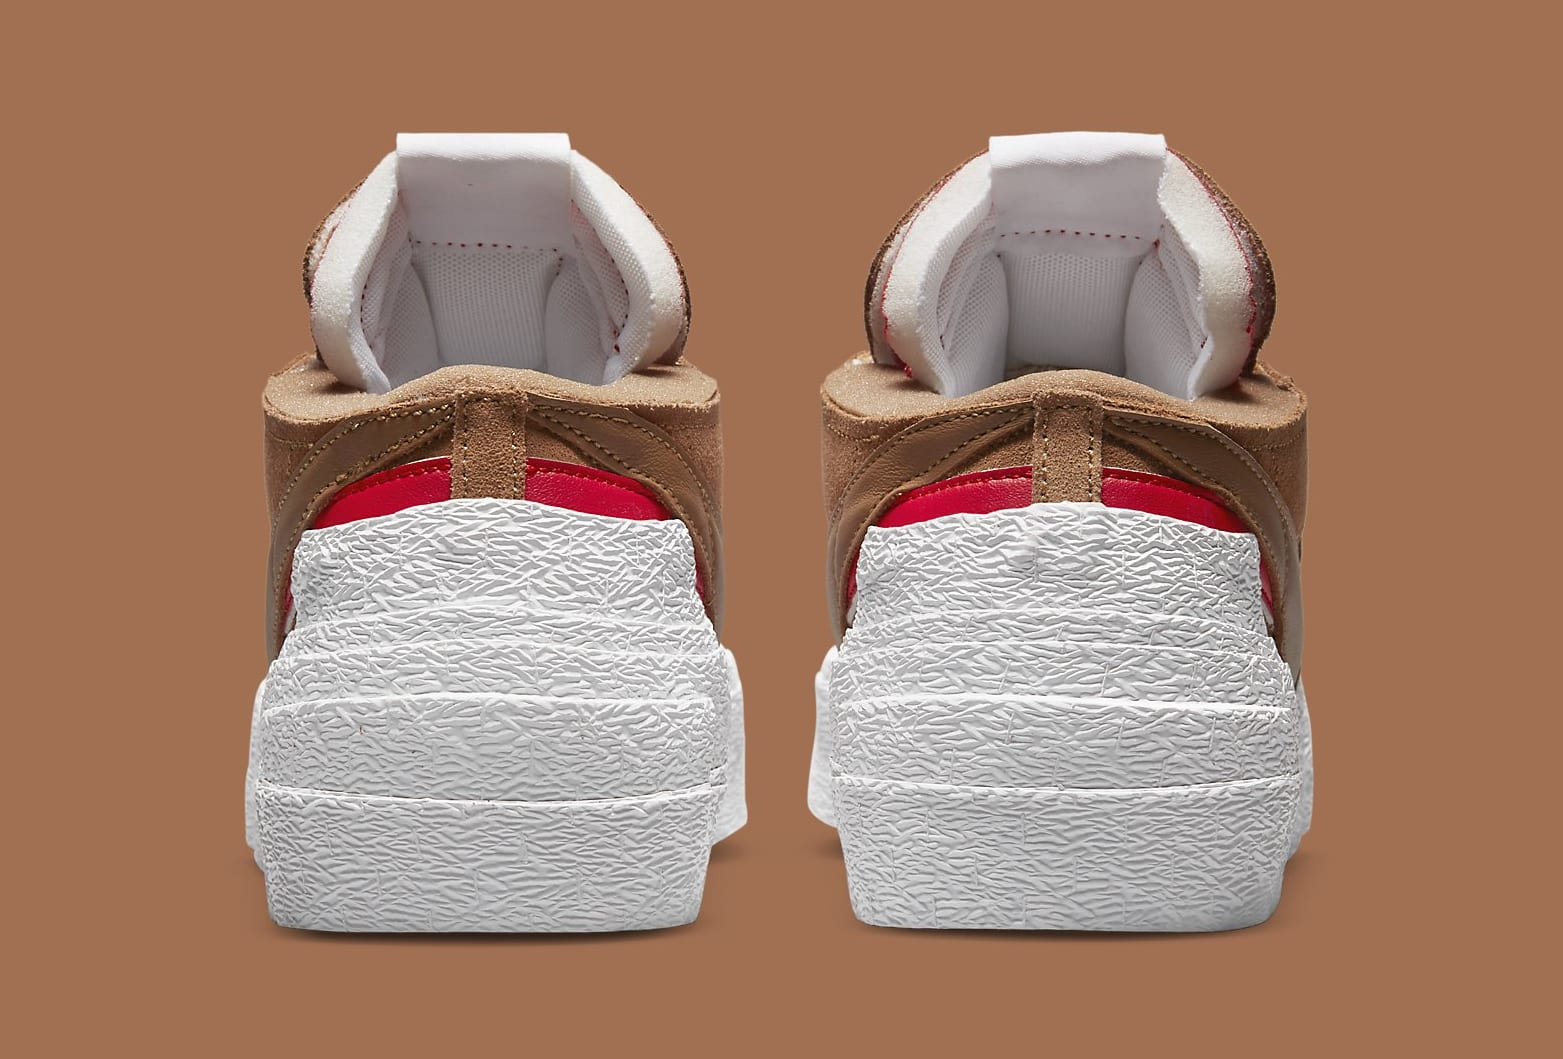 Sacai x Nike Blazer Low 'British Tan' DD1877-200 Heel